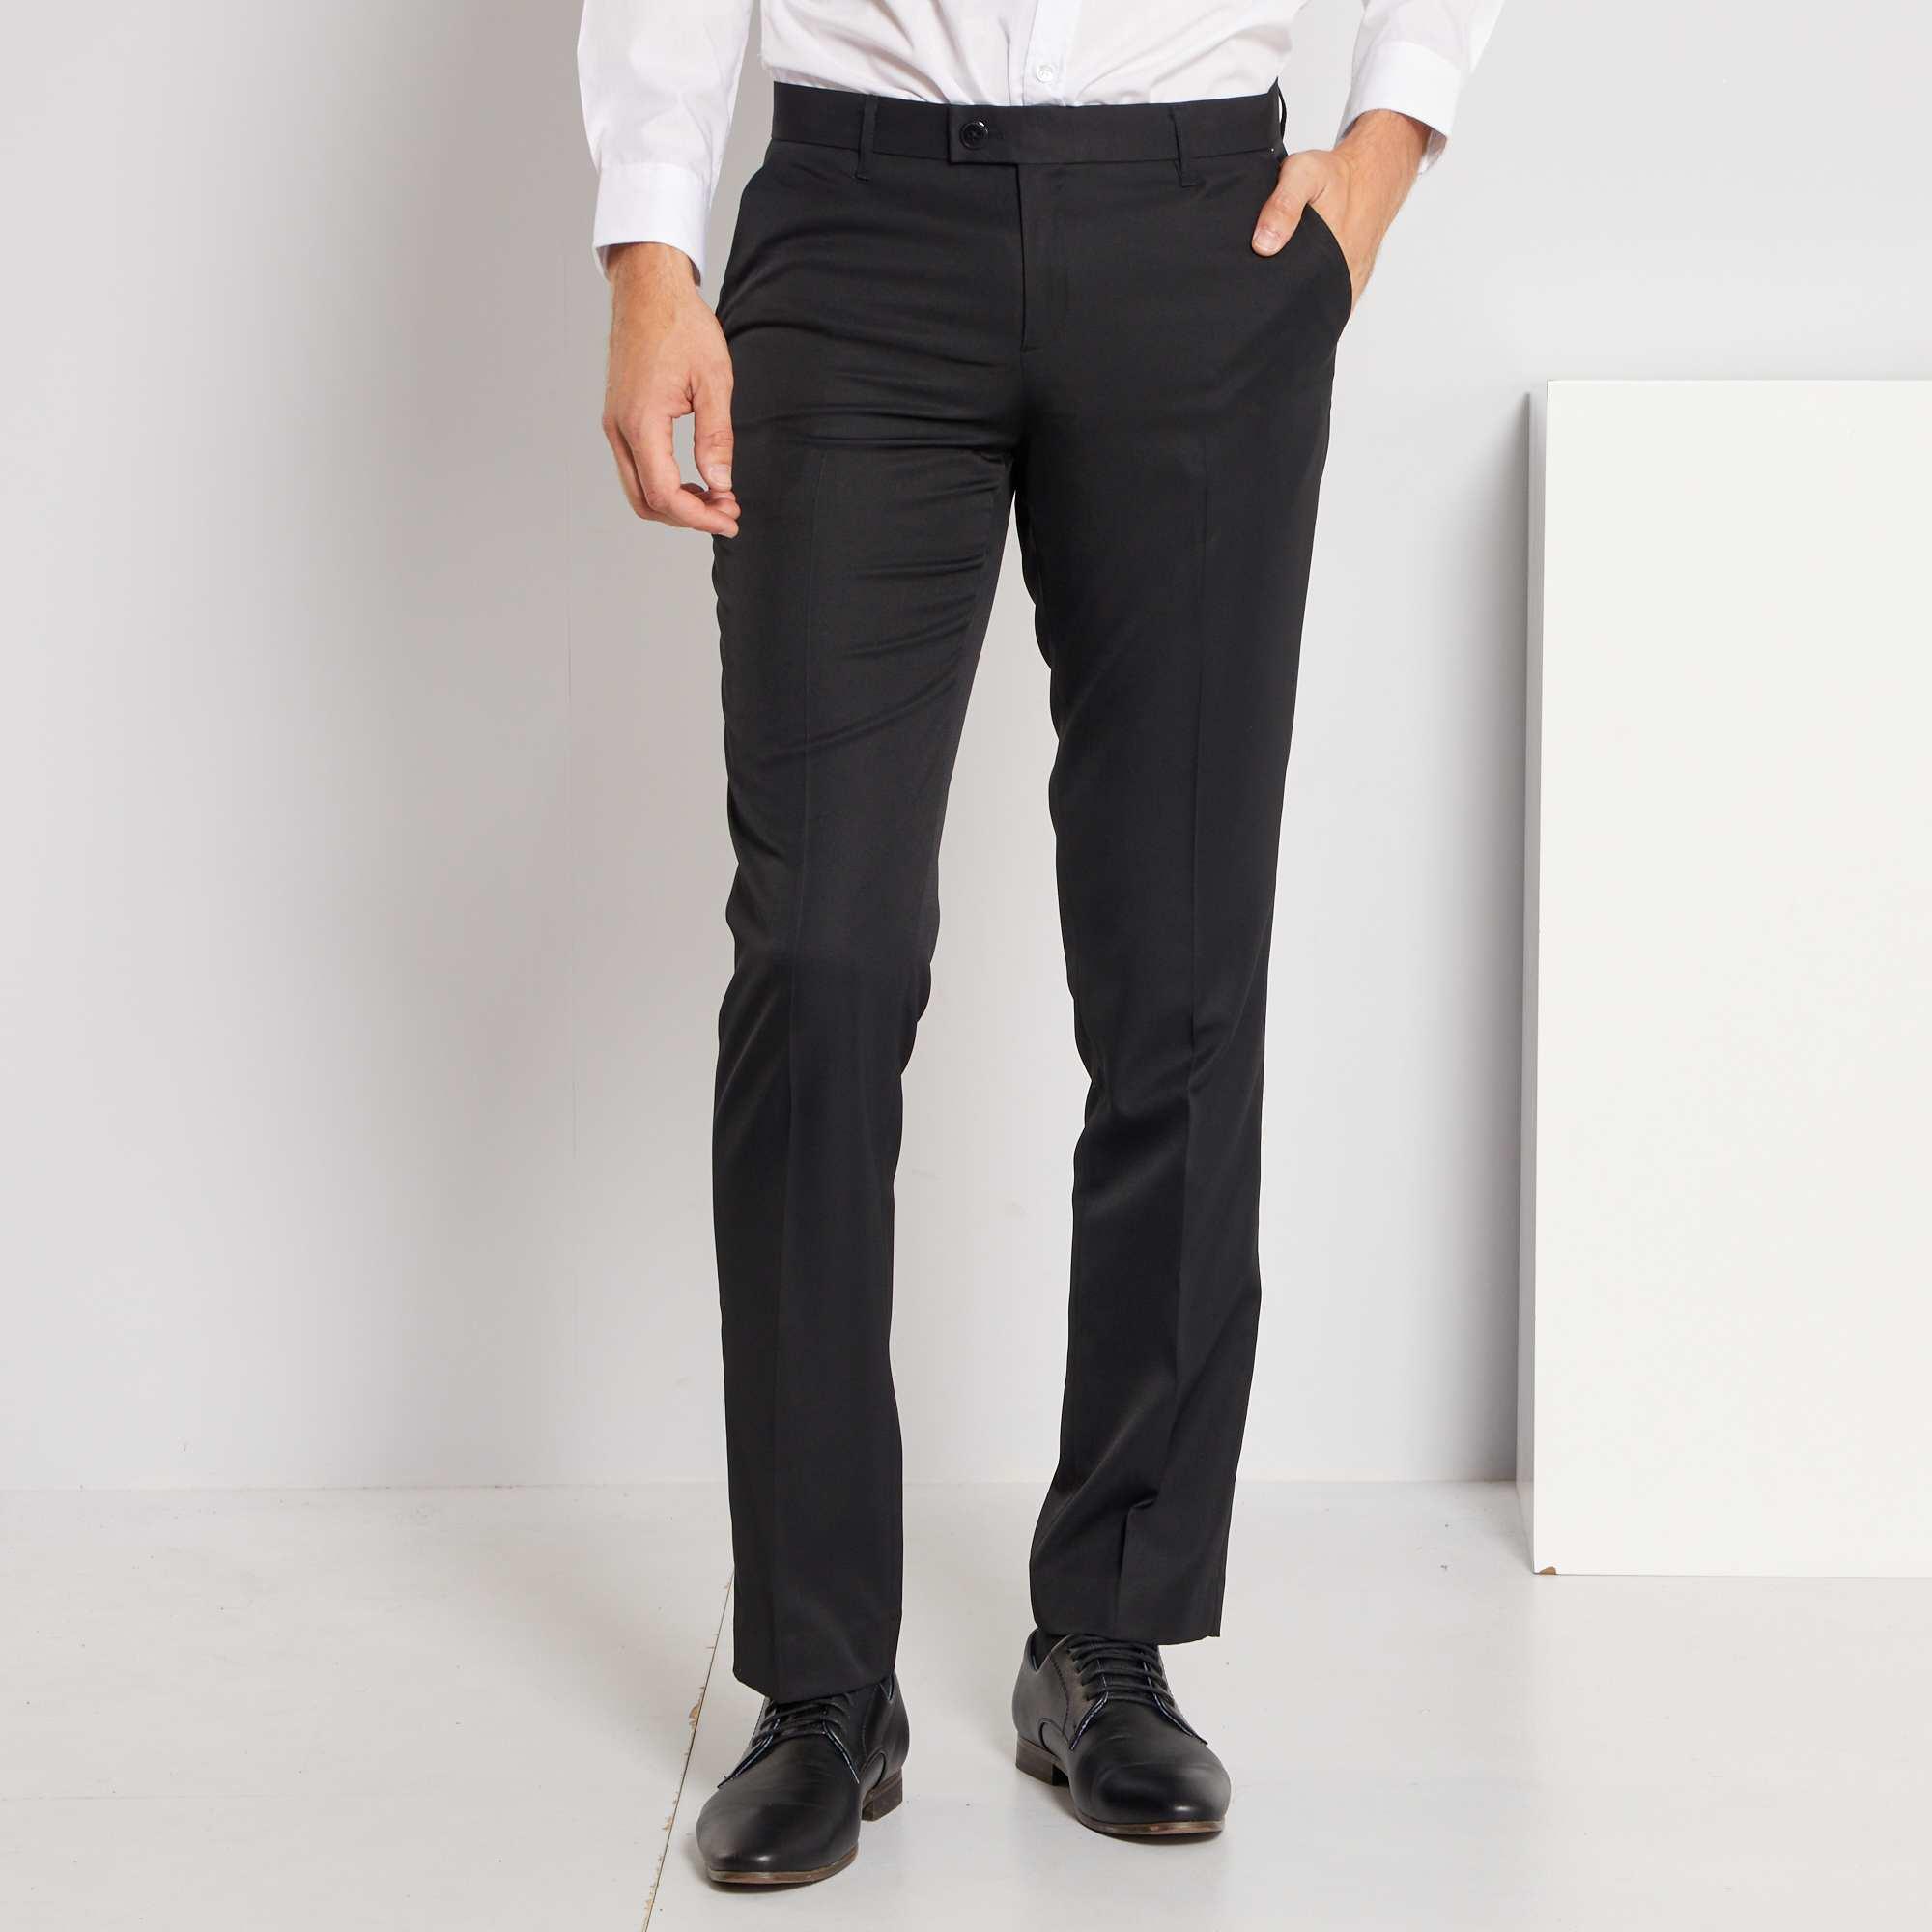 pantalon de costume regular en twill homme kiabi 15 00. Black Bedroom Furniture Sets. Home Design Ideas